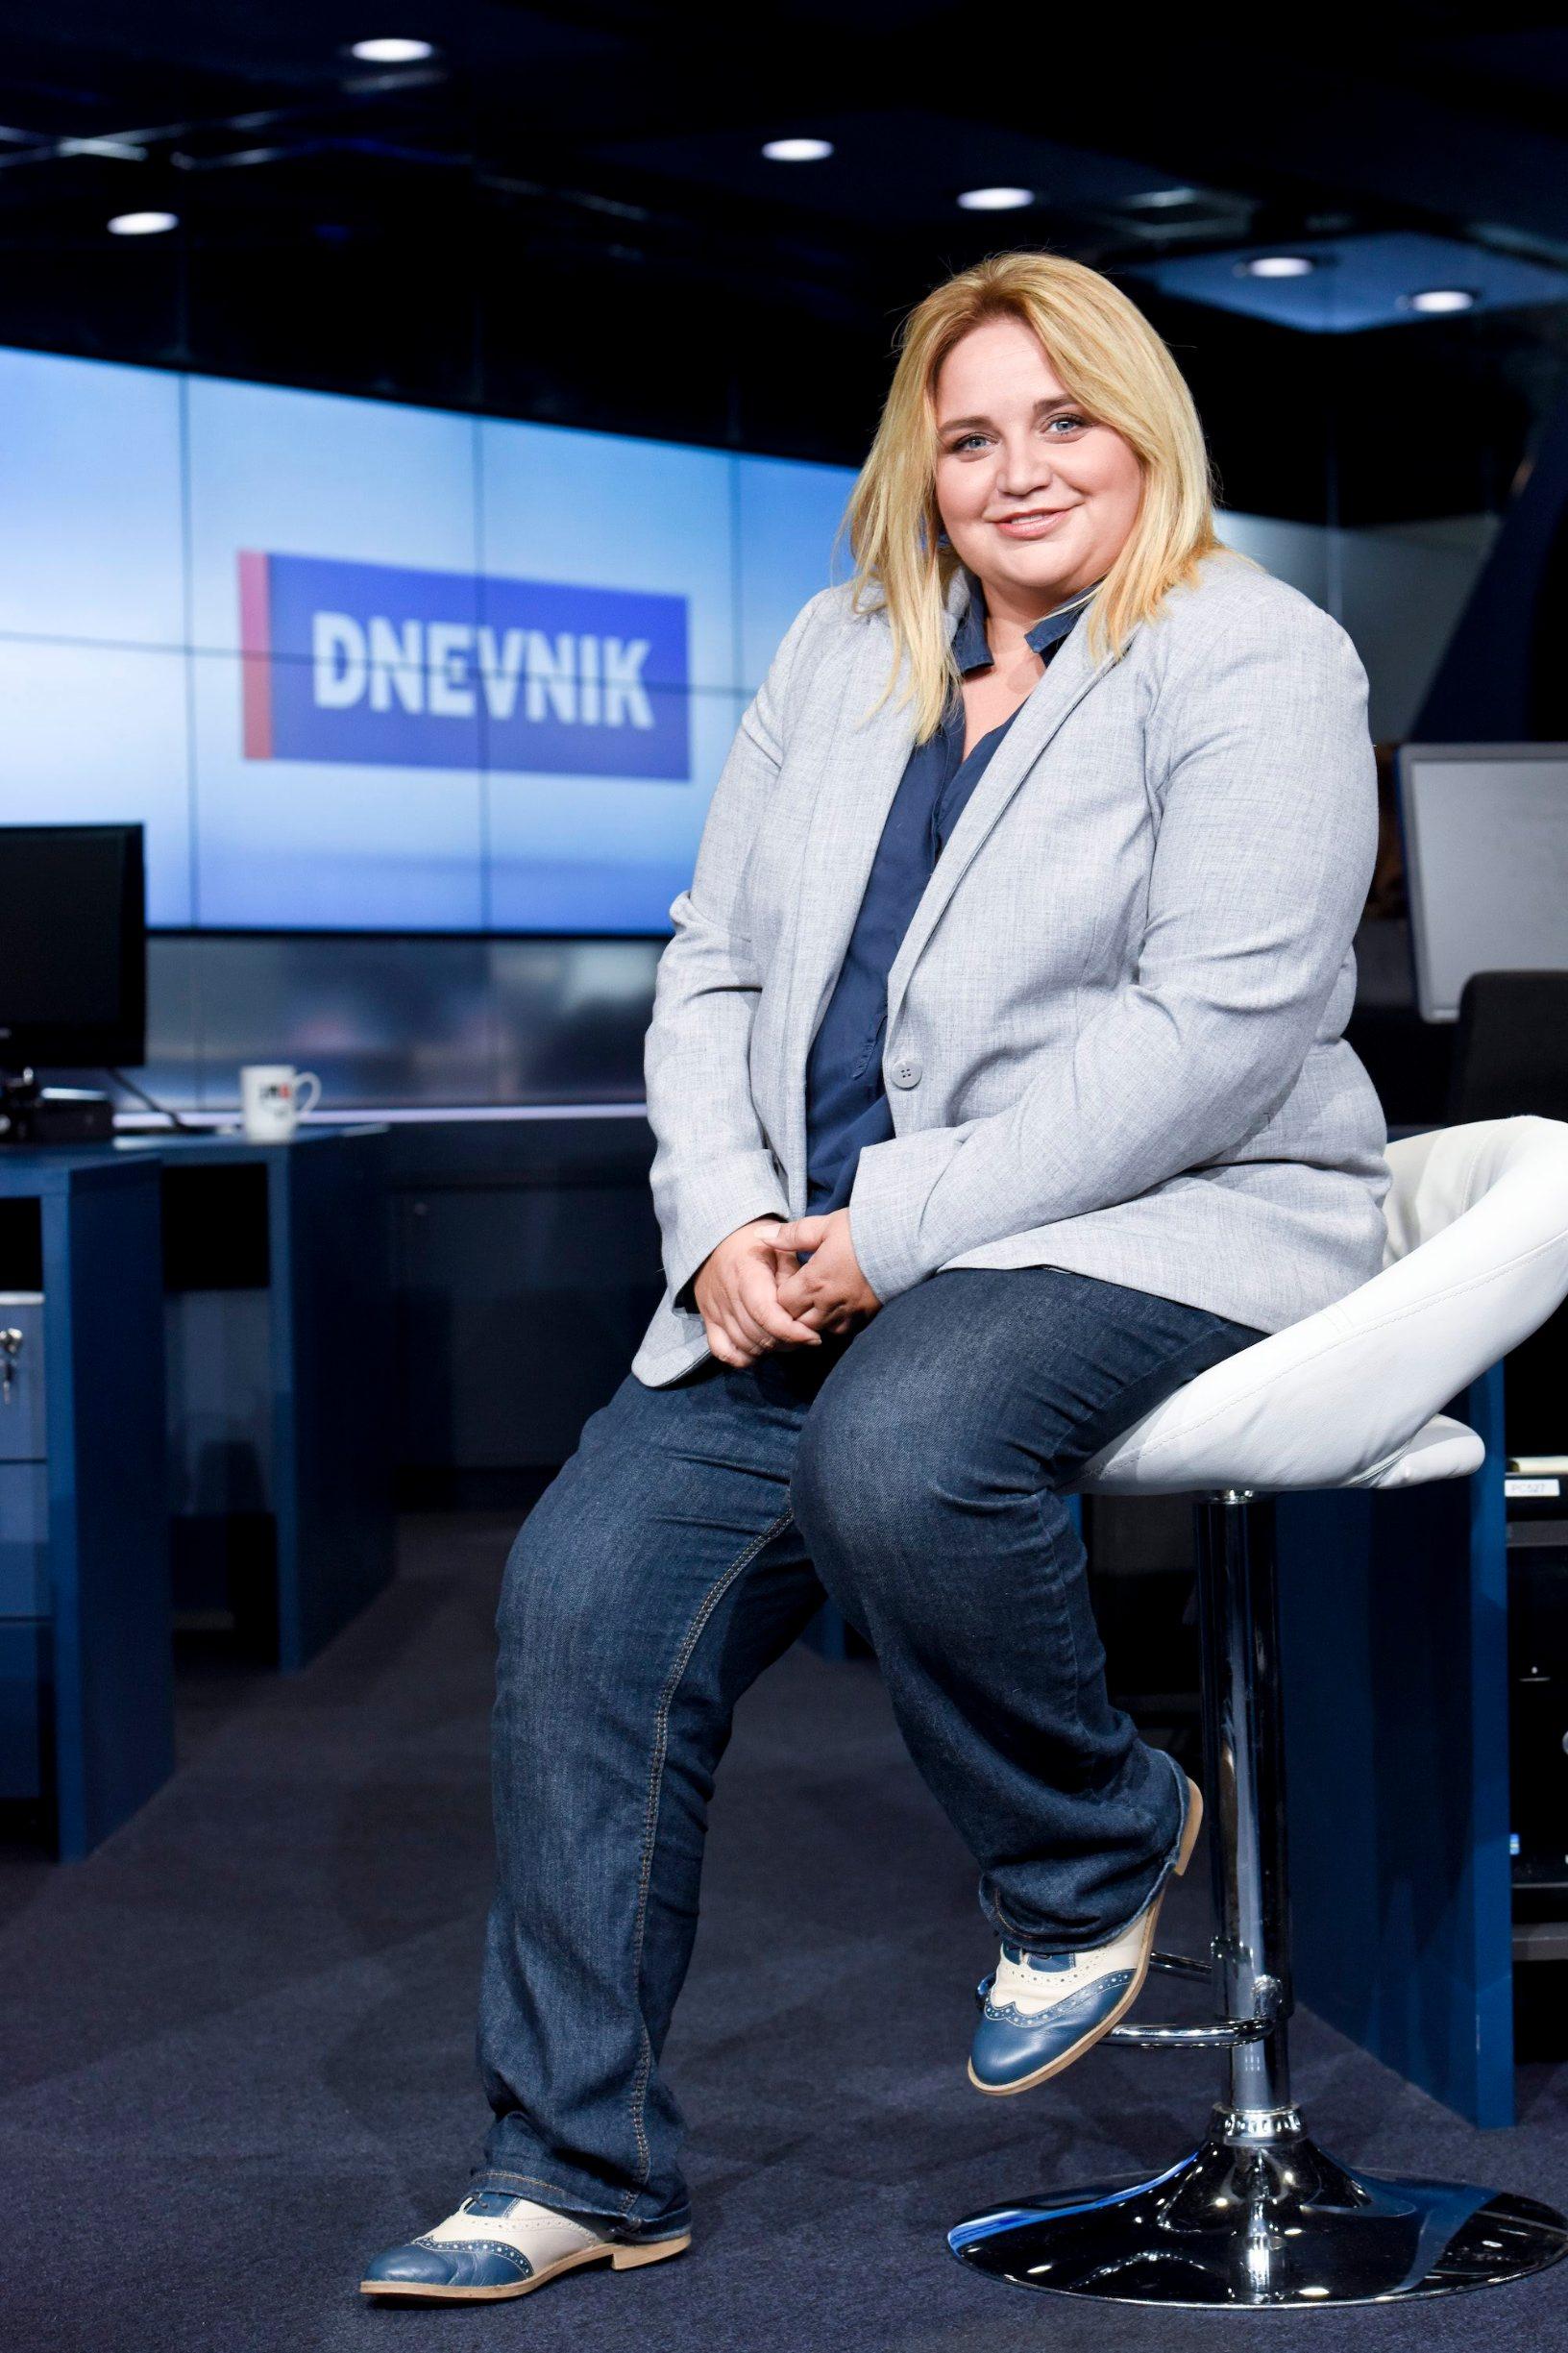 Zagreb, 160817. Remetinecka cesta 139. Tatjana Krajac, novinarka reporterka Nova TV. Foto: Darko Tomas / CROPIX